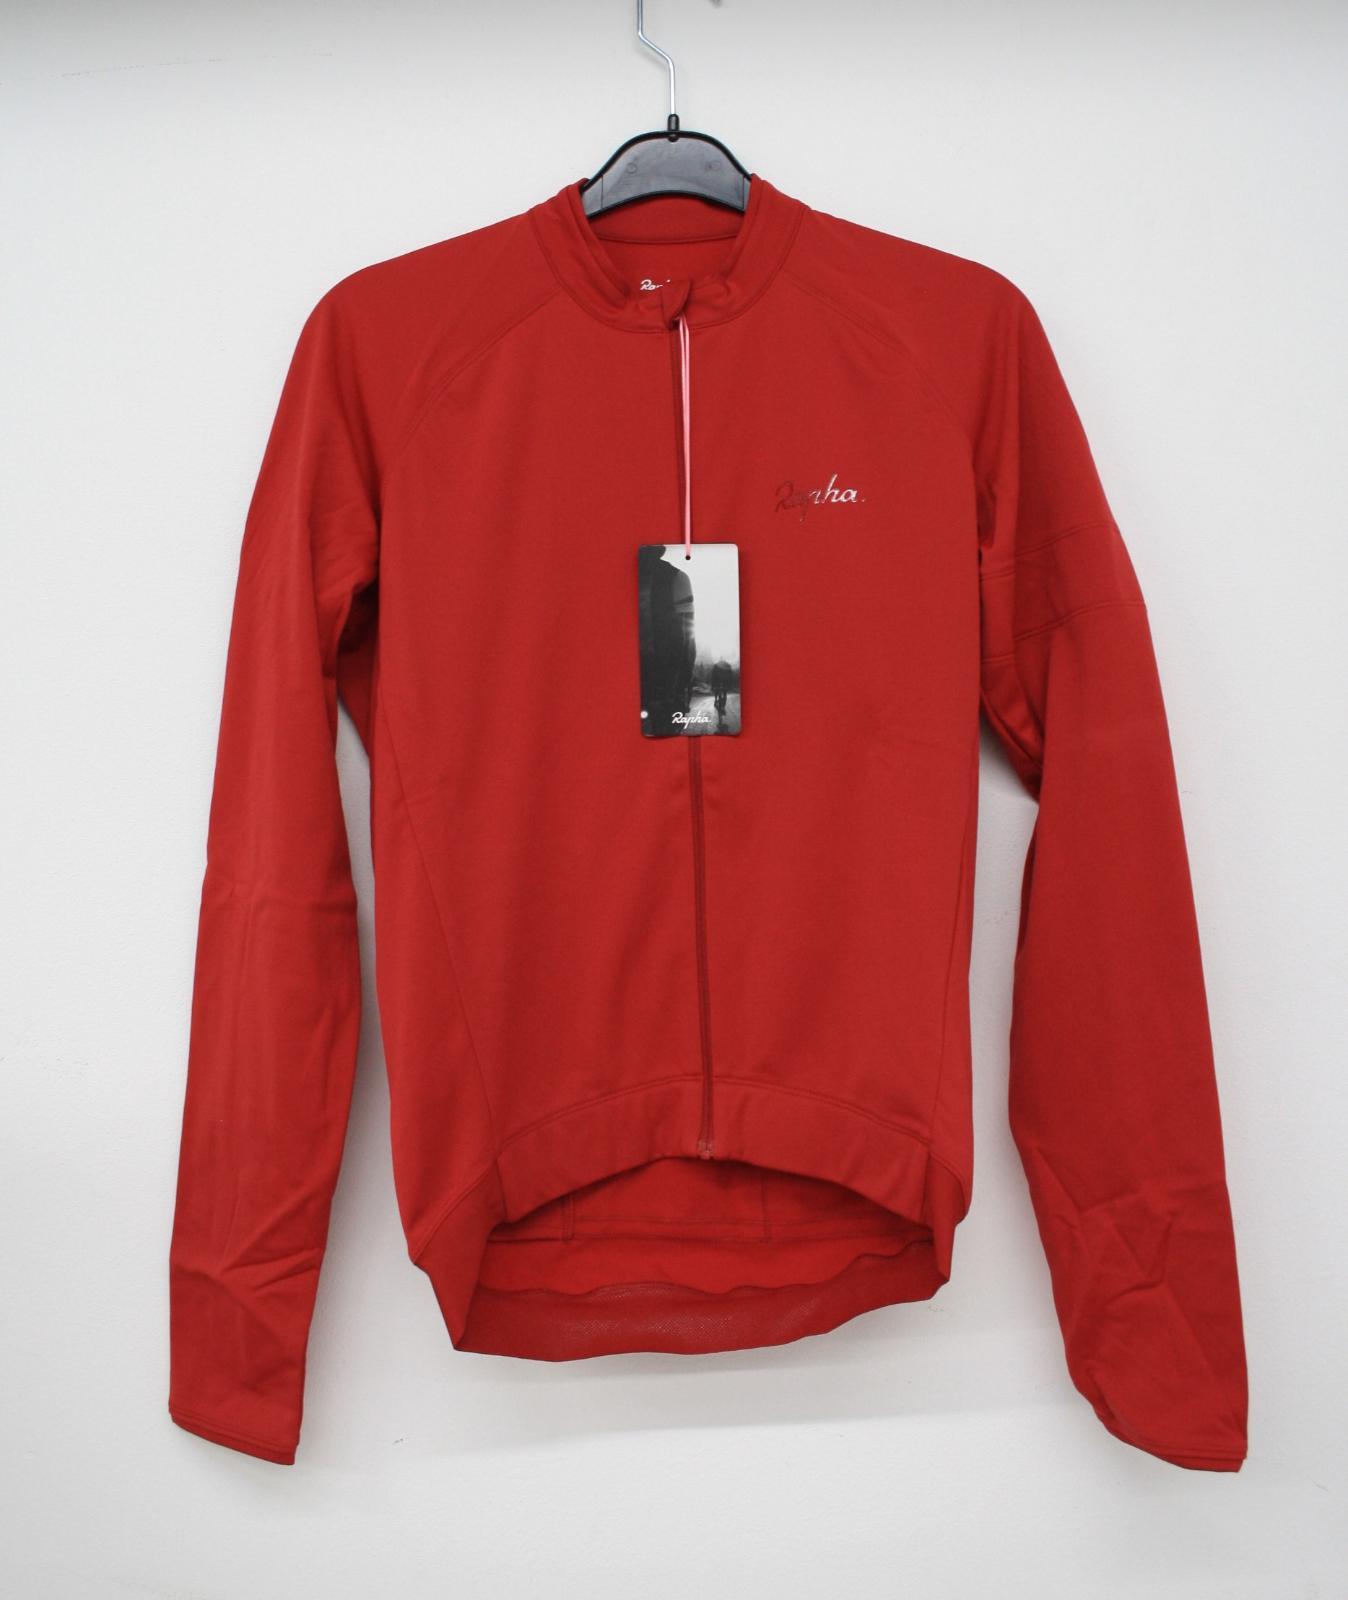 Homme RAPHA rouge à manches longues poches arrière cyclisme Core Jersey Taille S NEUF